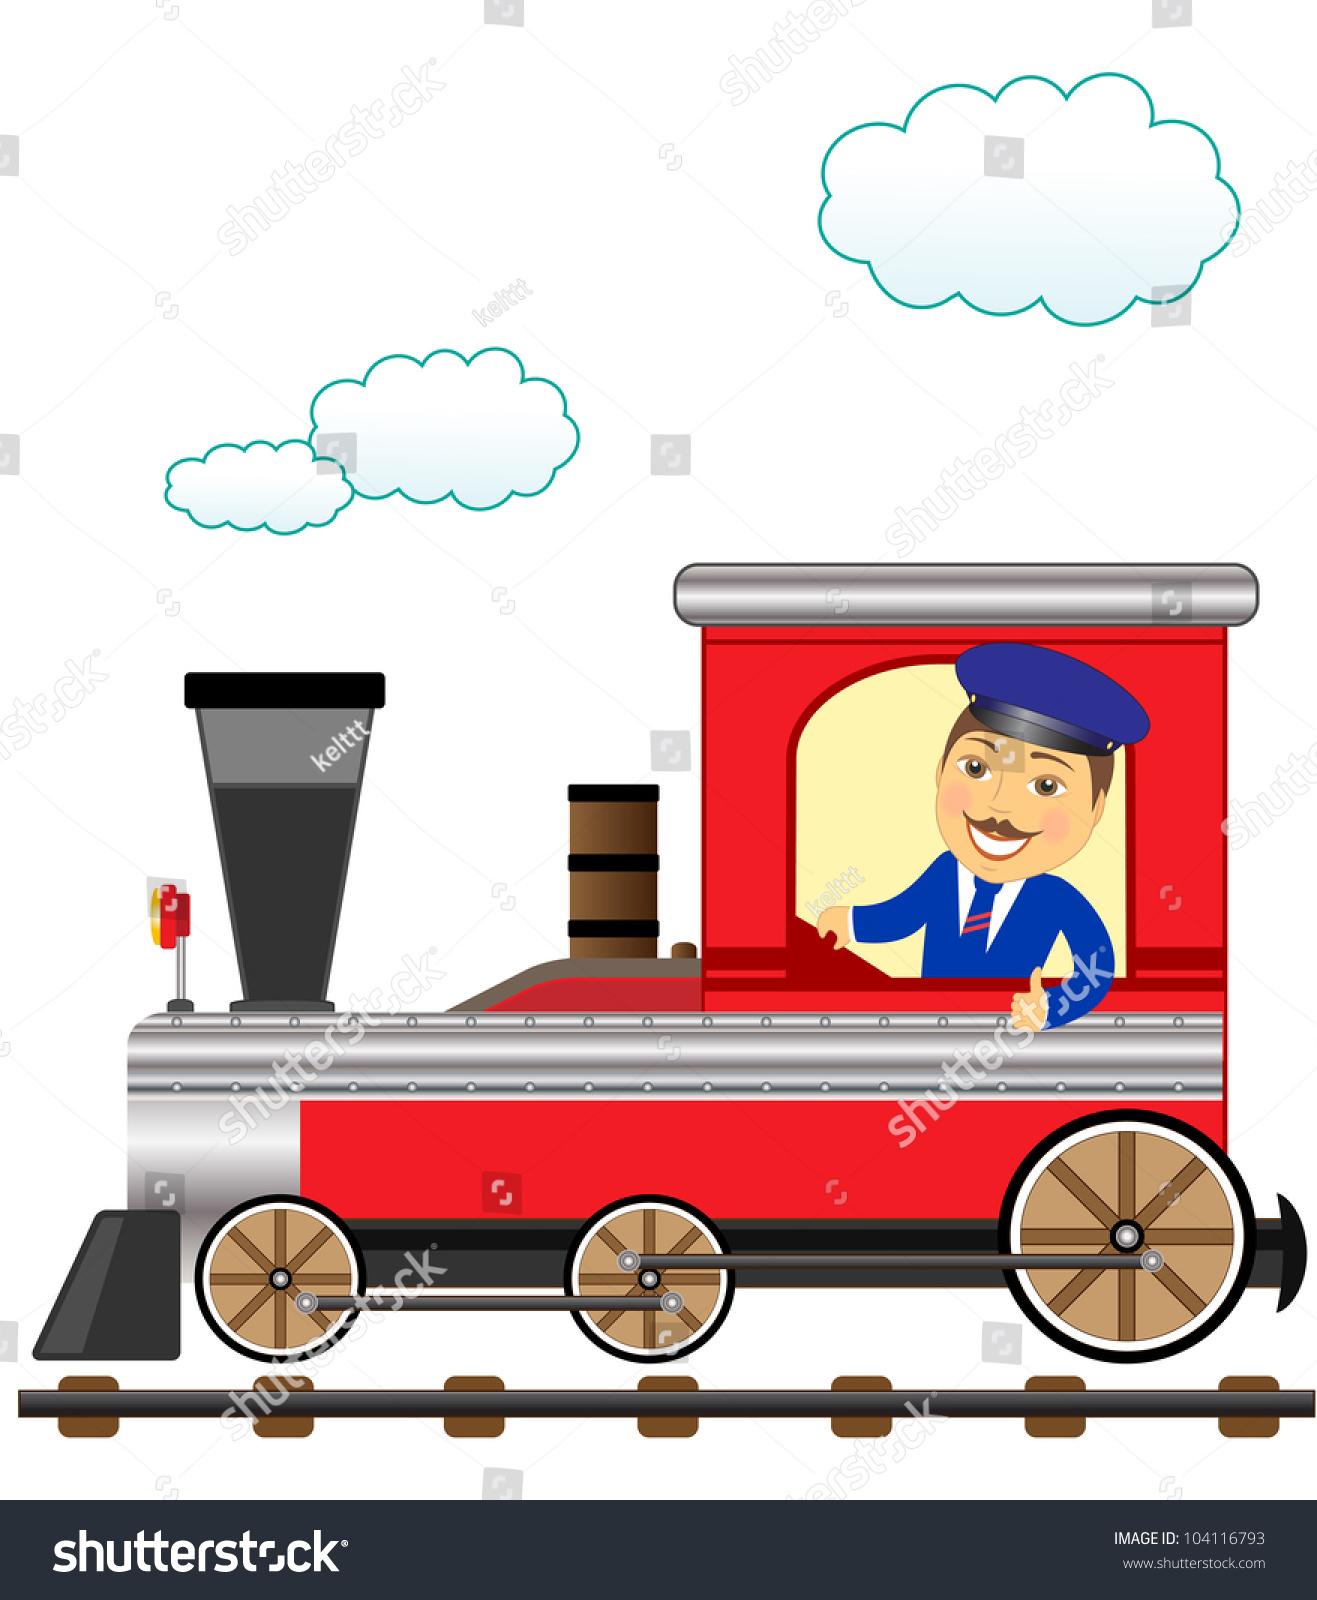 Blue Train Cartoon Stock Vector Cheerful Cartoon Train With Smile Conductor